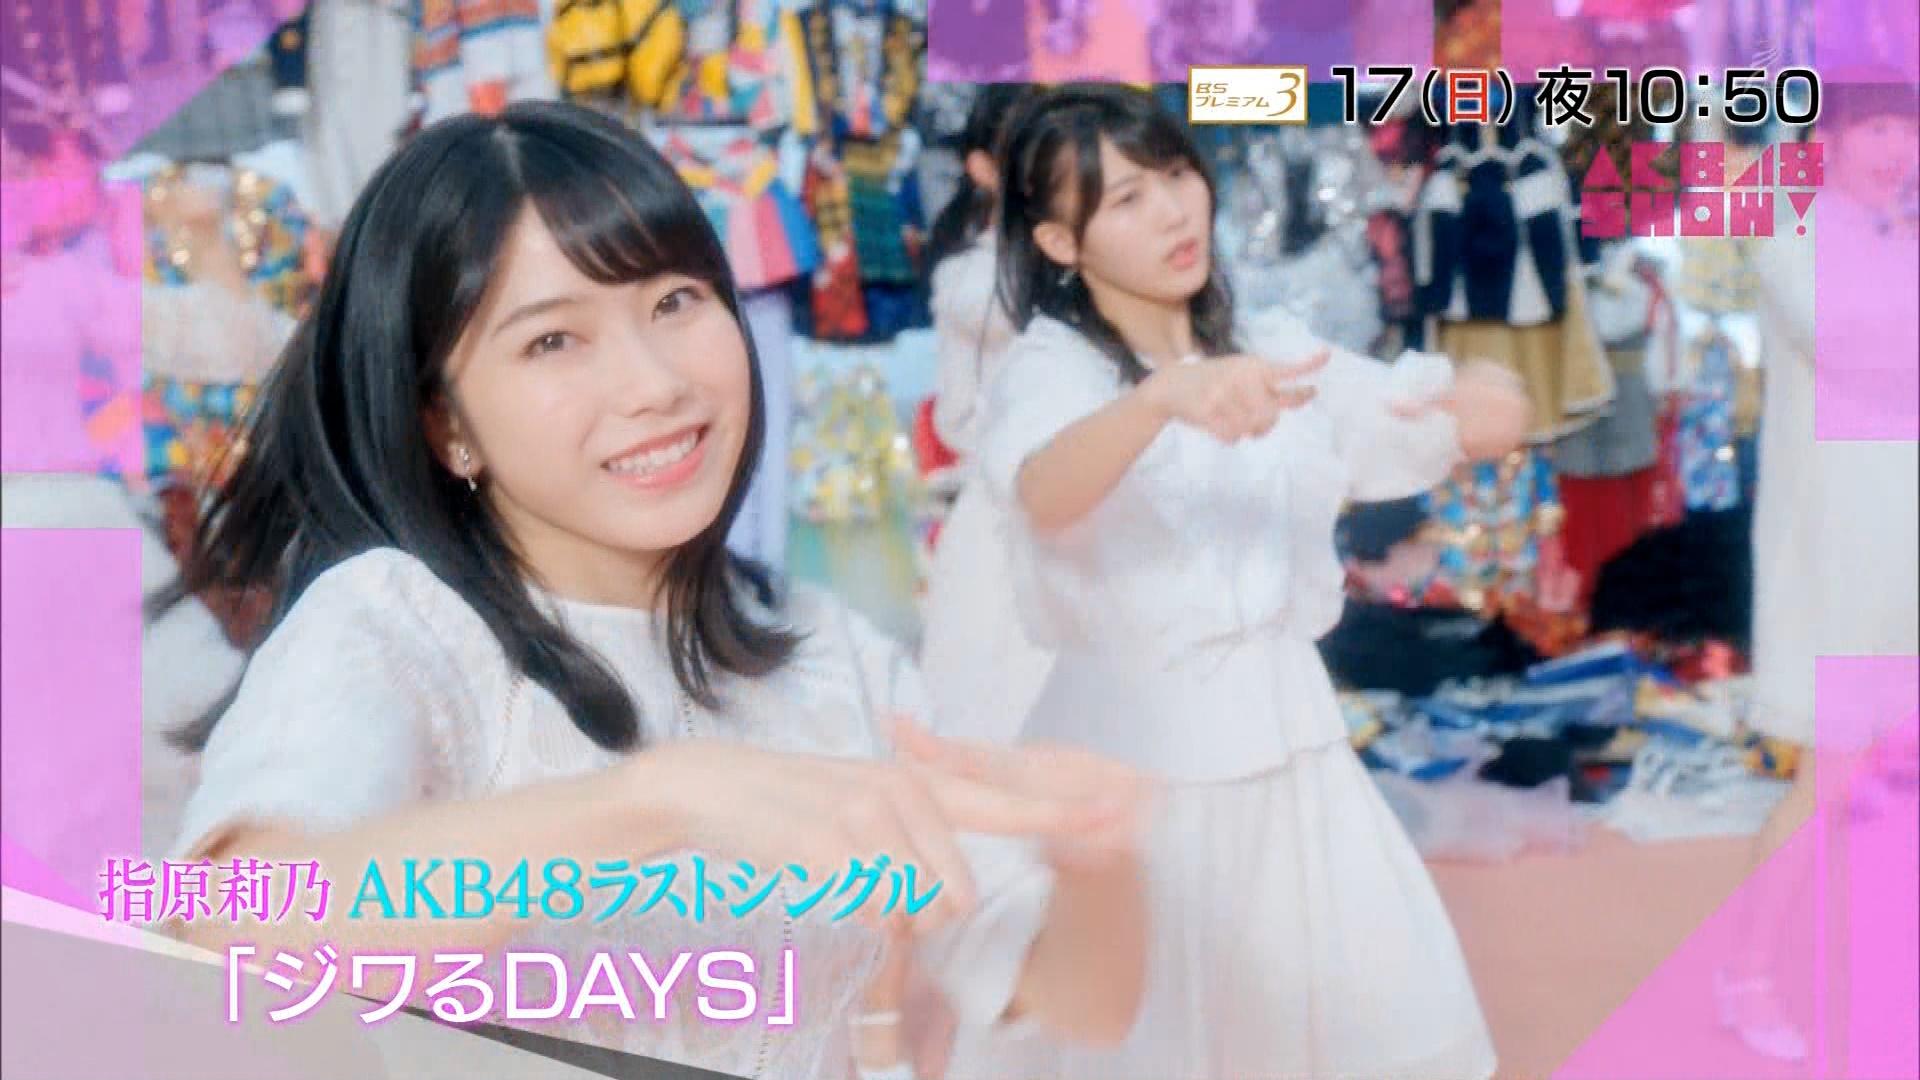 【AKB48】横山由依応援スレ676【ゆいはん】 YouTube動画>5本 ->画像>692枚